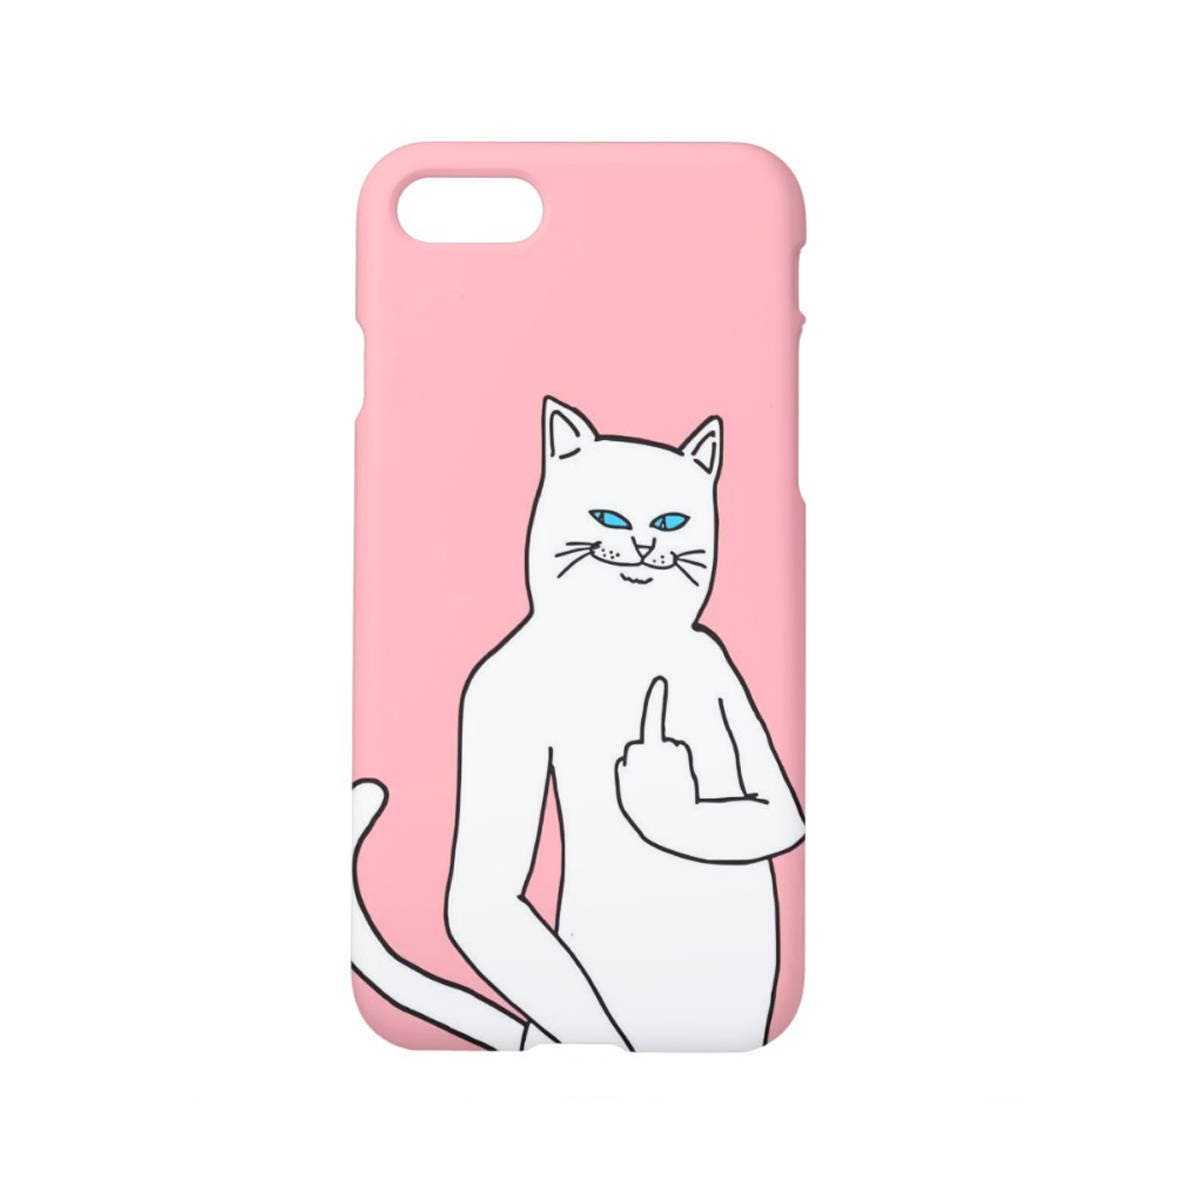 Electronics Cases Custom Hardcase Midnight Dots Iphone 4 5 5c 6 Plus 7 Case Cat Cute X 8